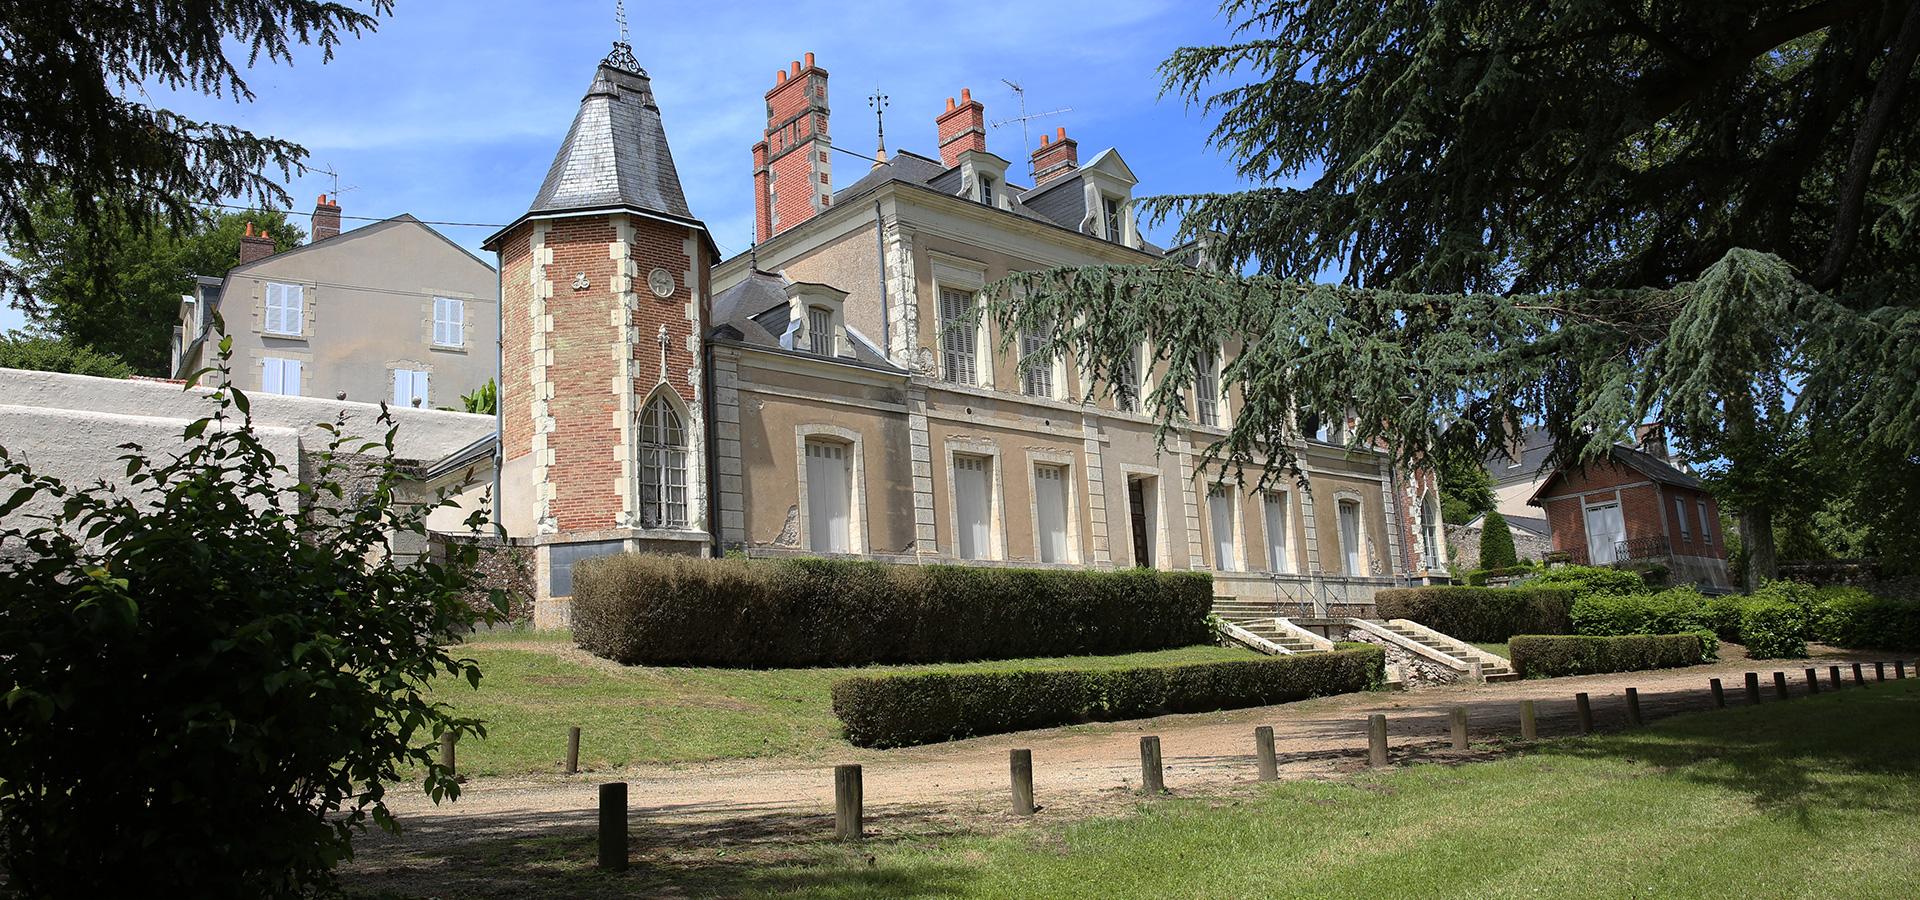 chateau-La-Chaussee-Saint-Victor